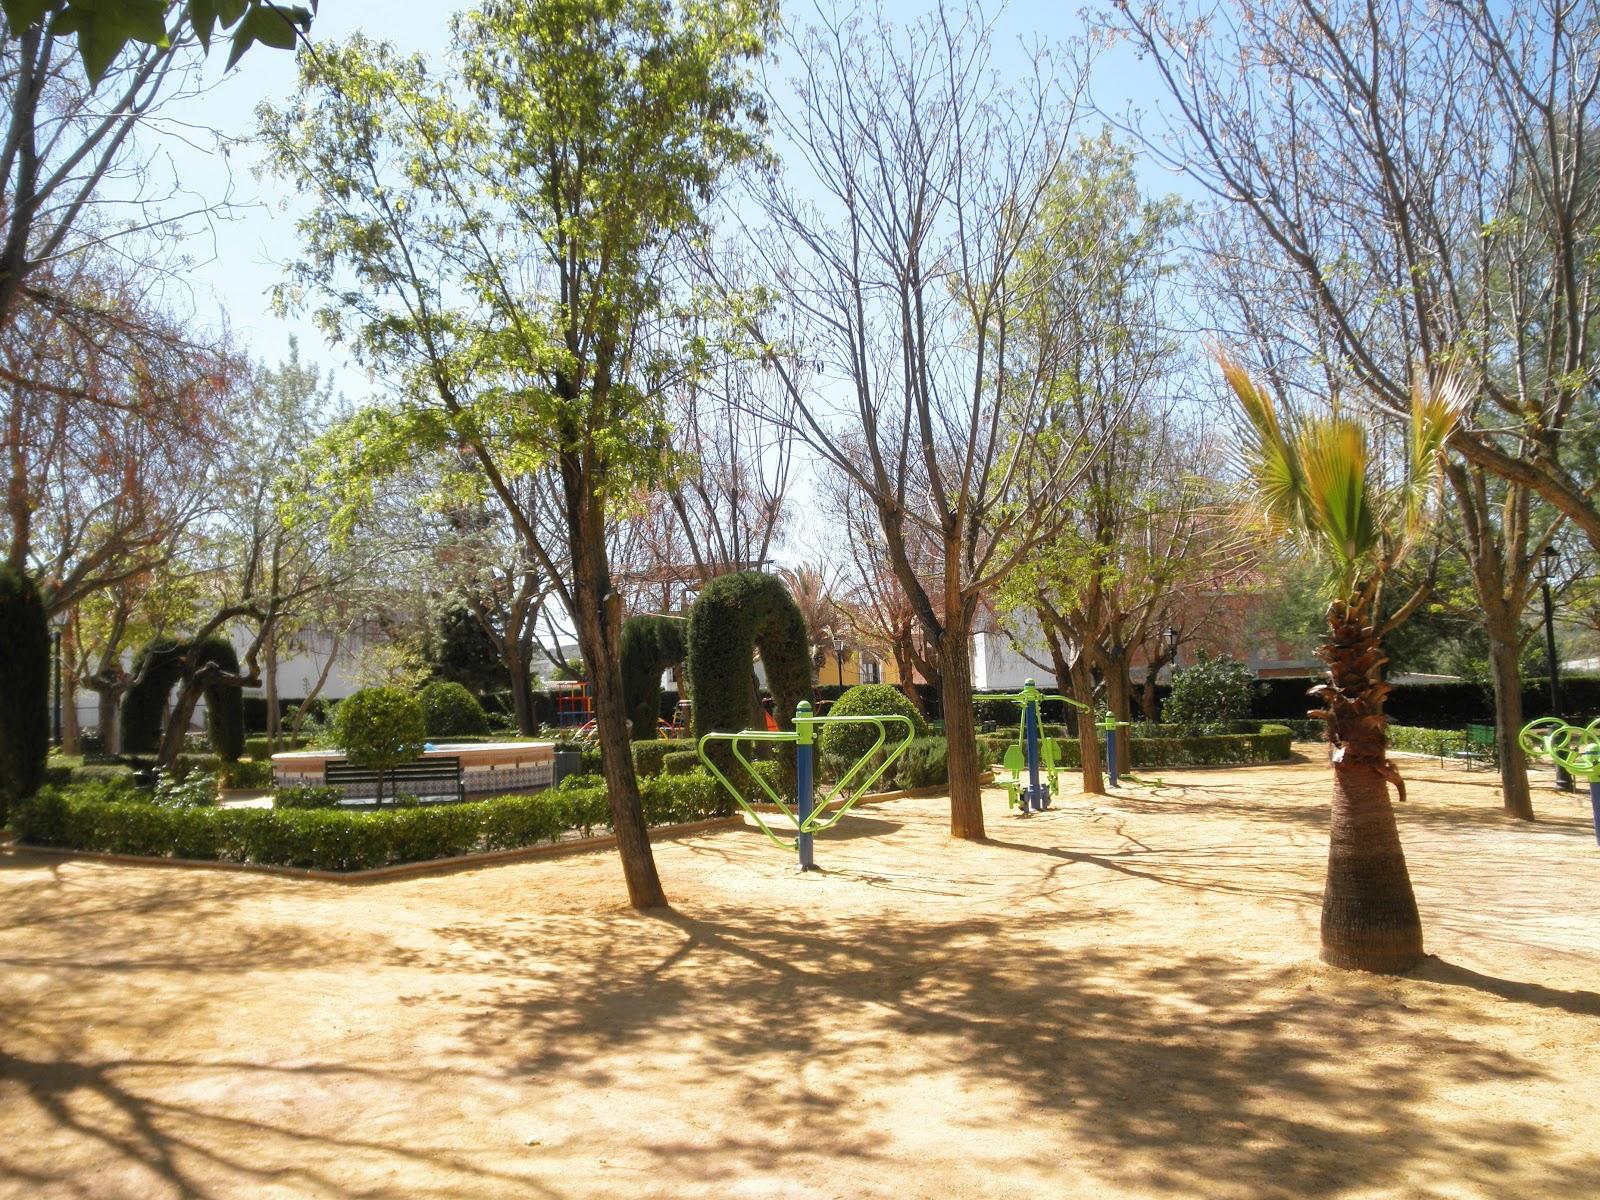 Cr nicas de casariche 2 parques de casariche for Piscinas casariche